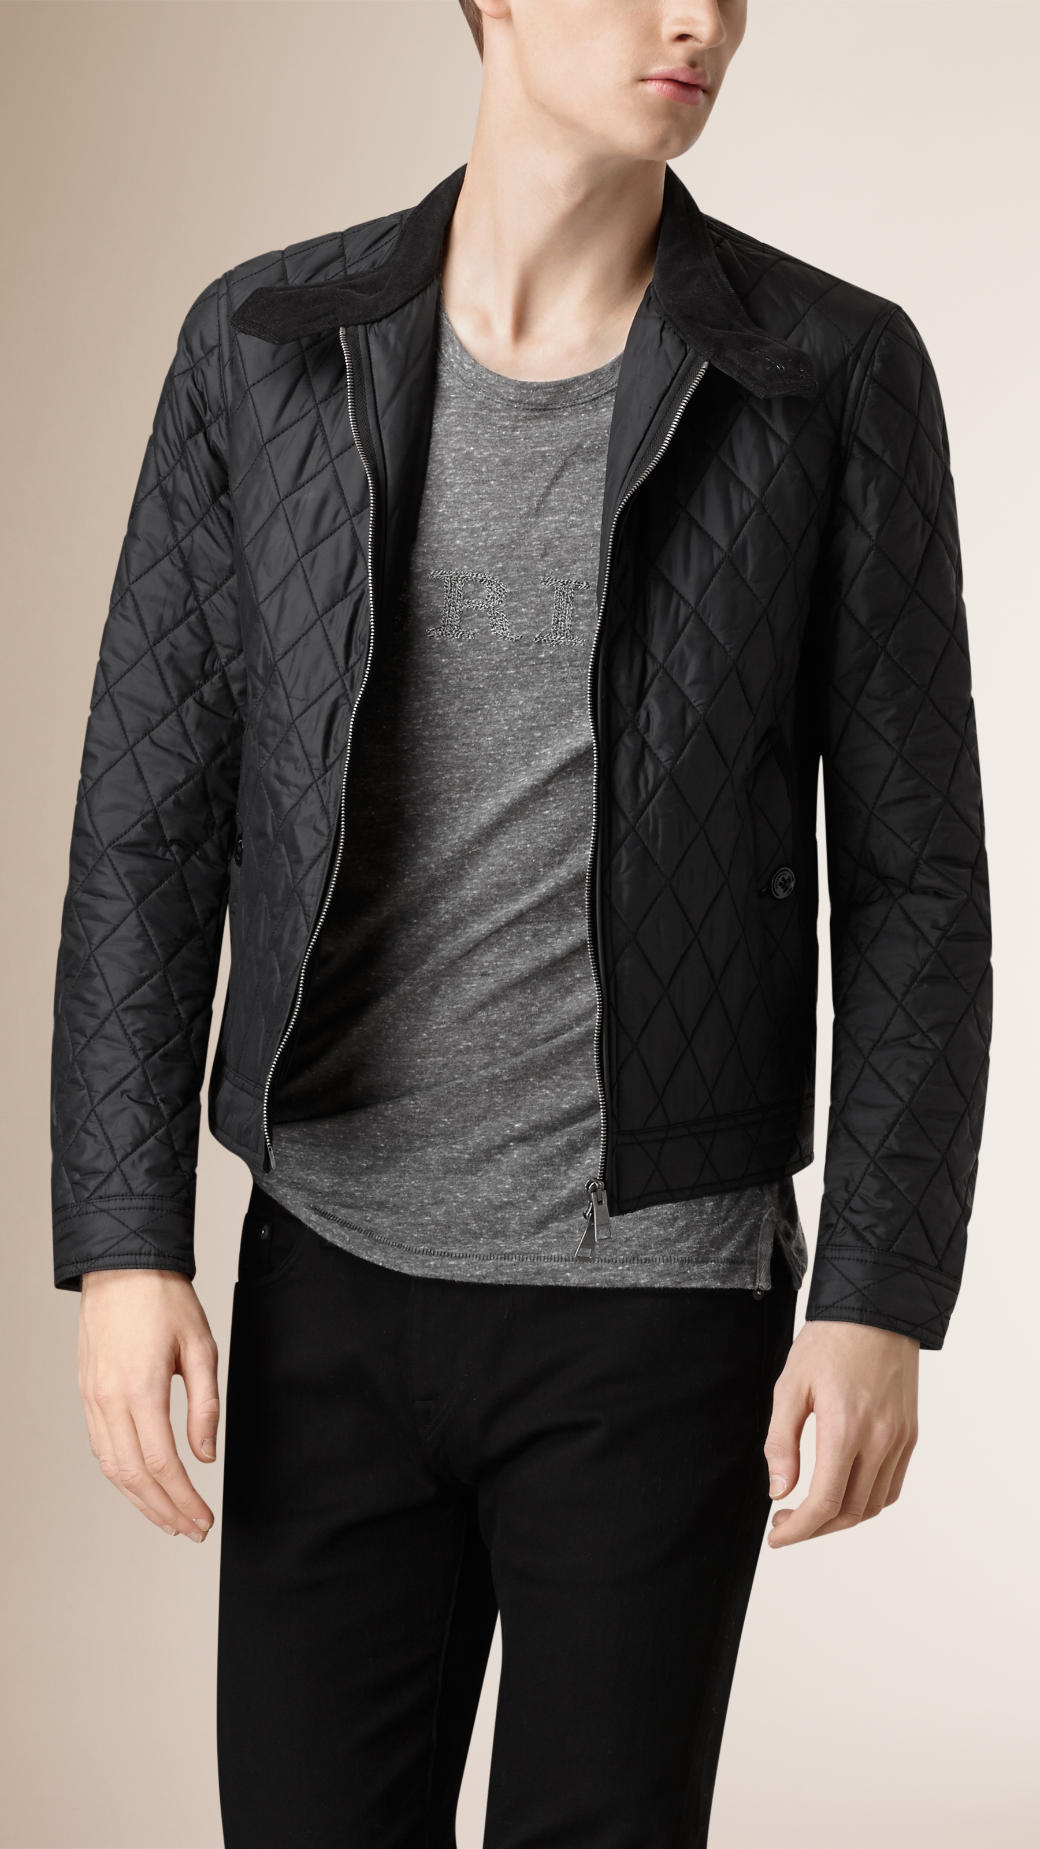 Burberry Diamond Quilted Harrington Jacket in Black for Men | Lyst : burberry diamond quilted jacket sale - Adamdwight.com